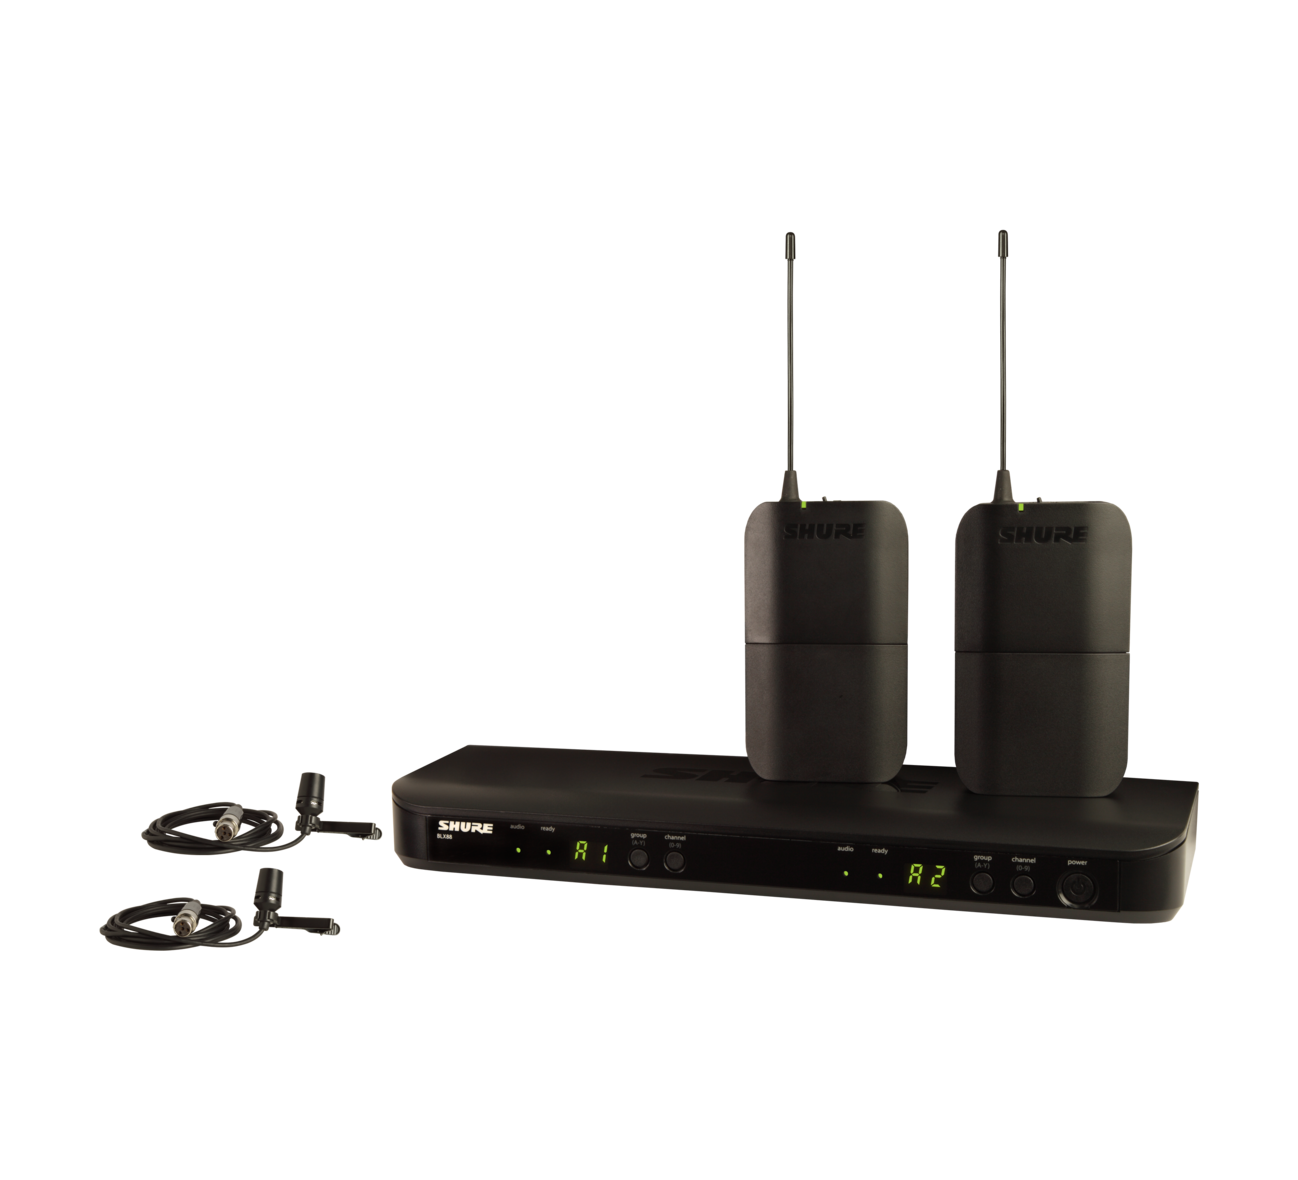 Shure BLX188/CVL Dual Lavalier Wireless System - CVL